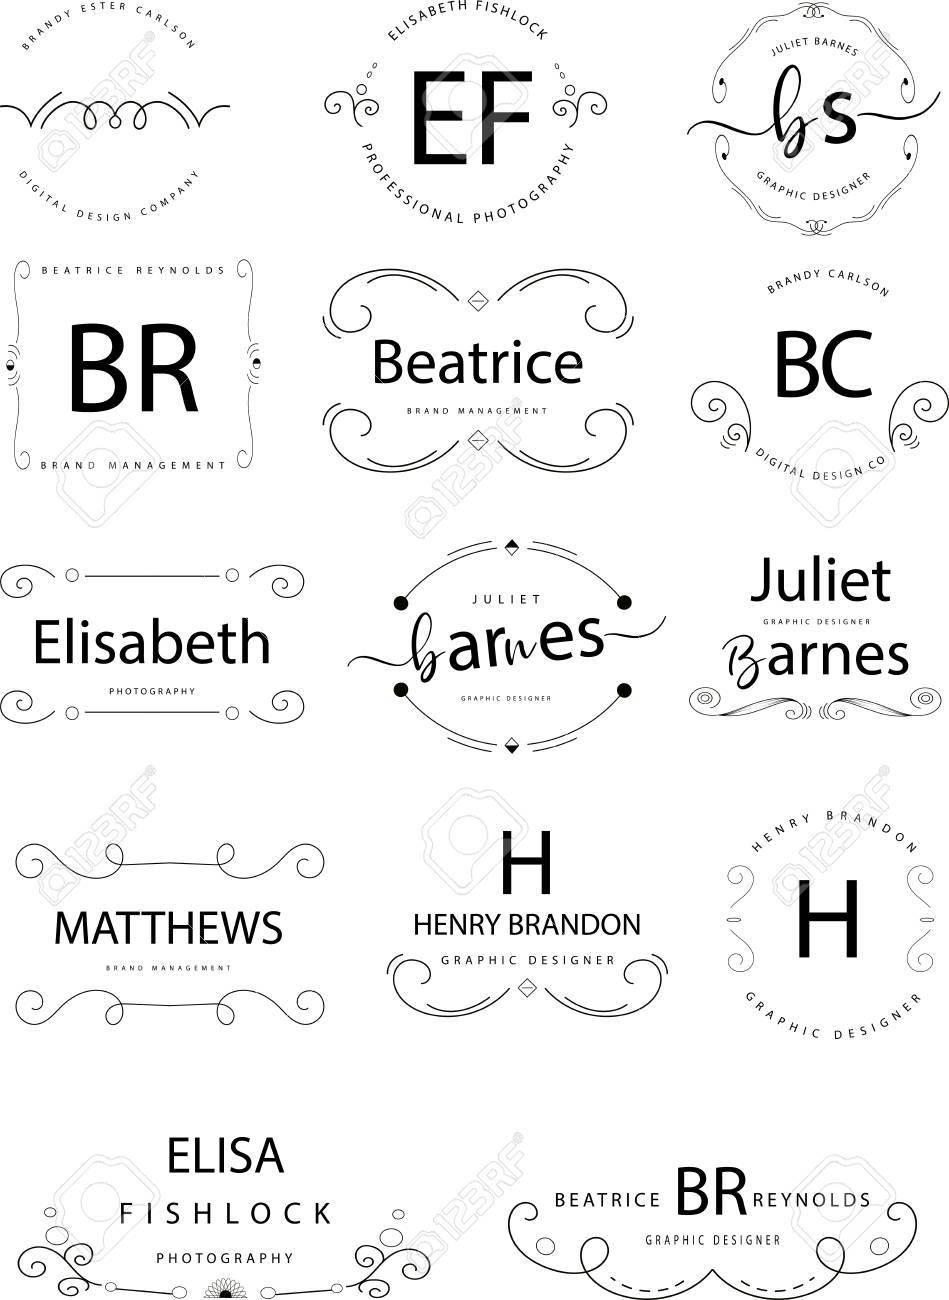 Retro Vintage Insignias or Logotypes set. Vector design elements. - 94296753